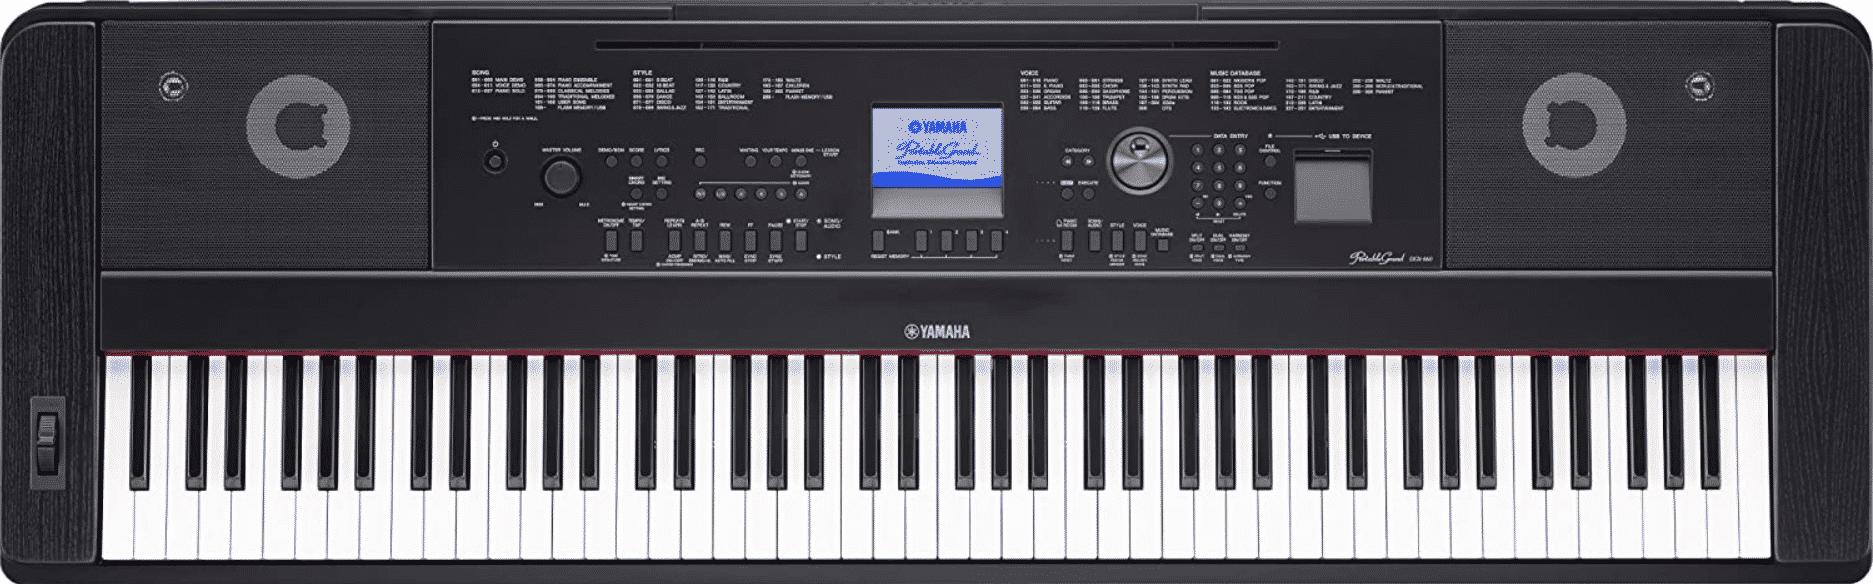 DGX 660 Overview